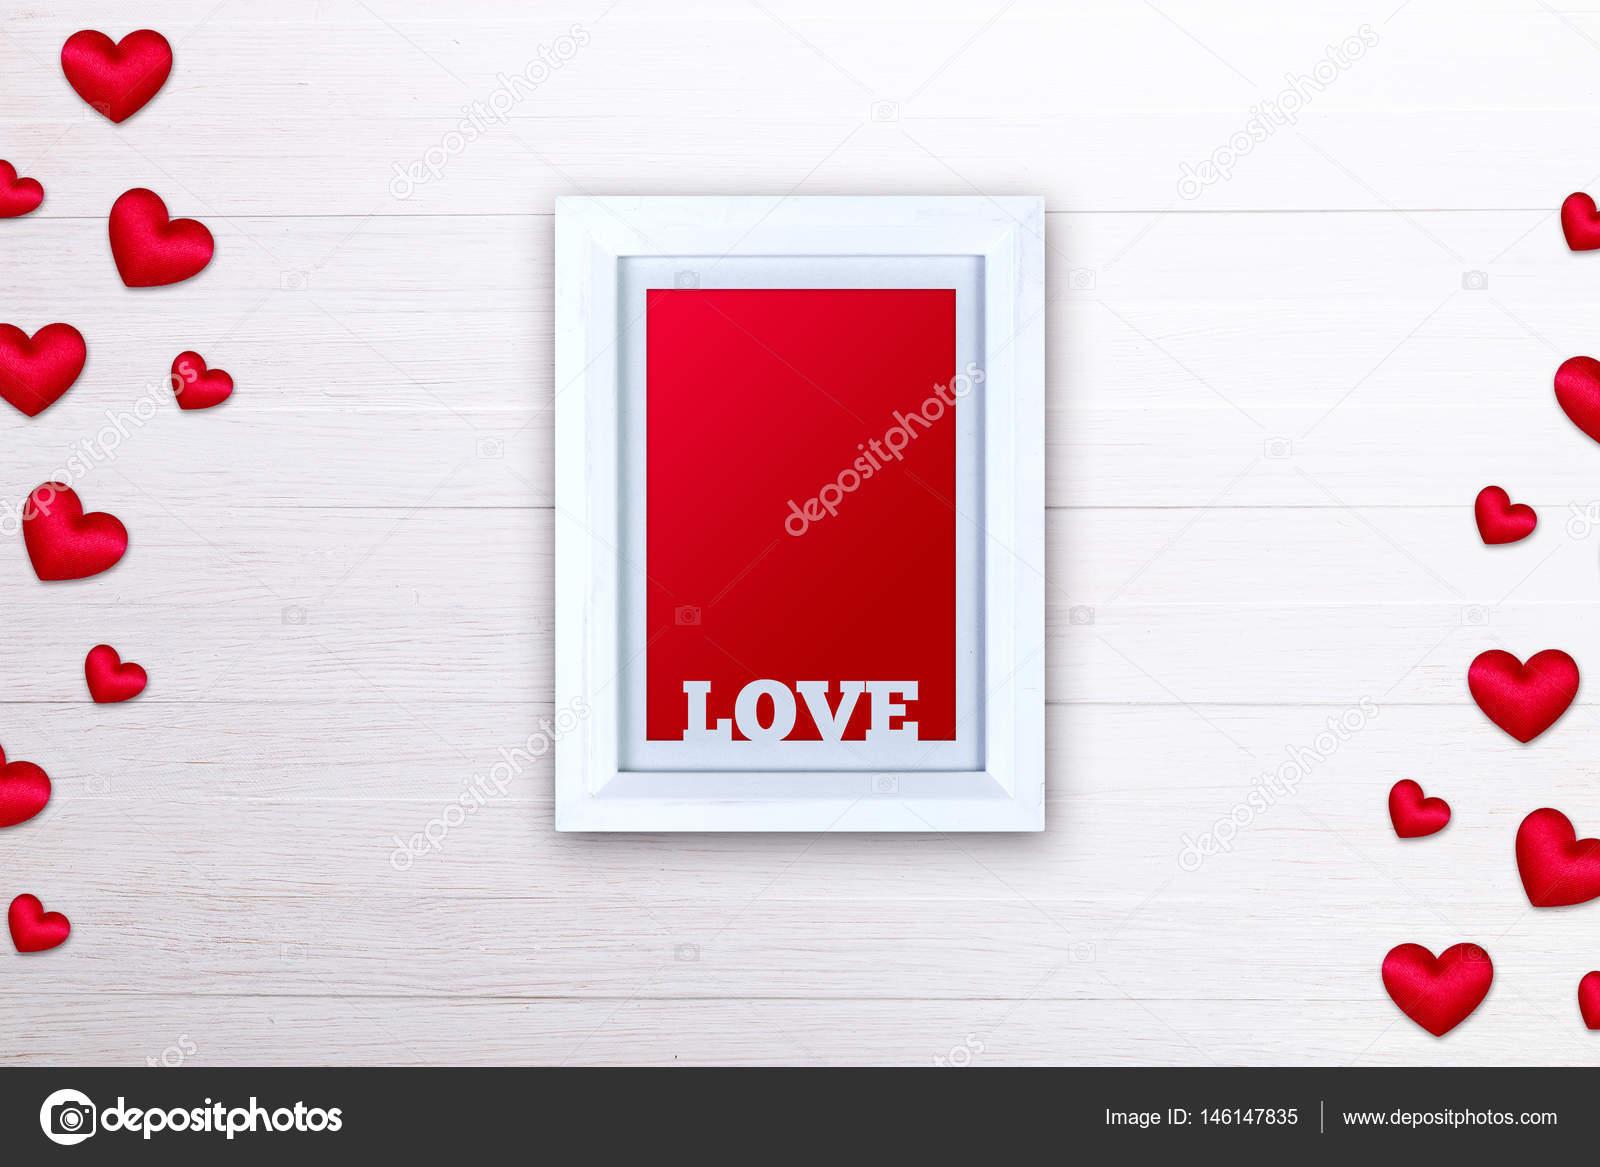 Leere Bilderrahmen. Rote satin Herzen. Liebe design — Stockfoto ...